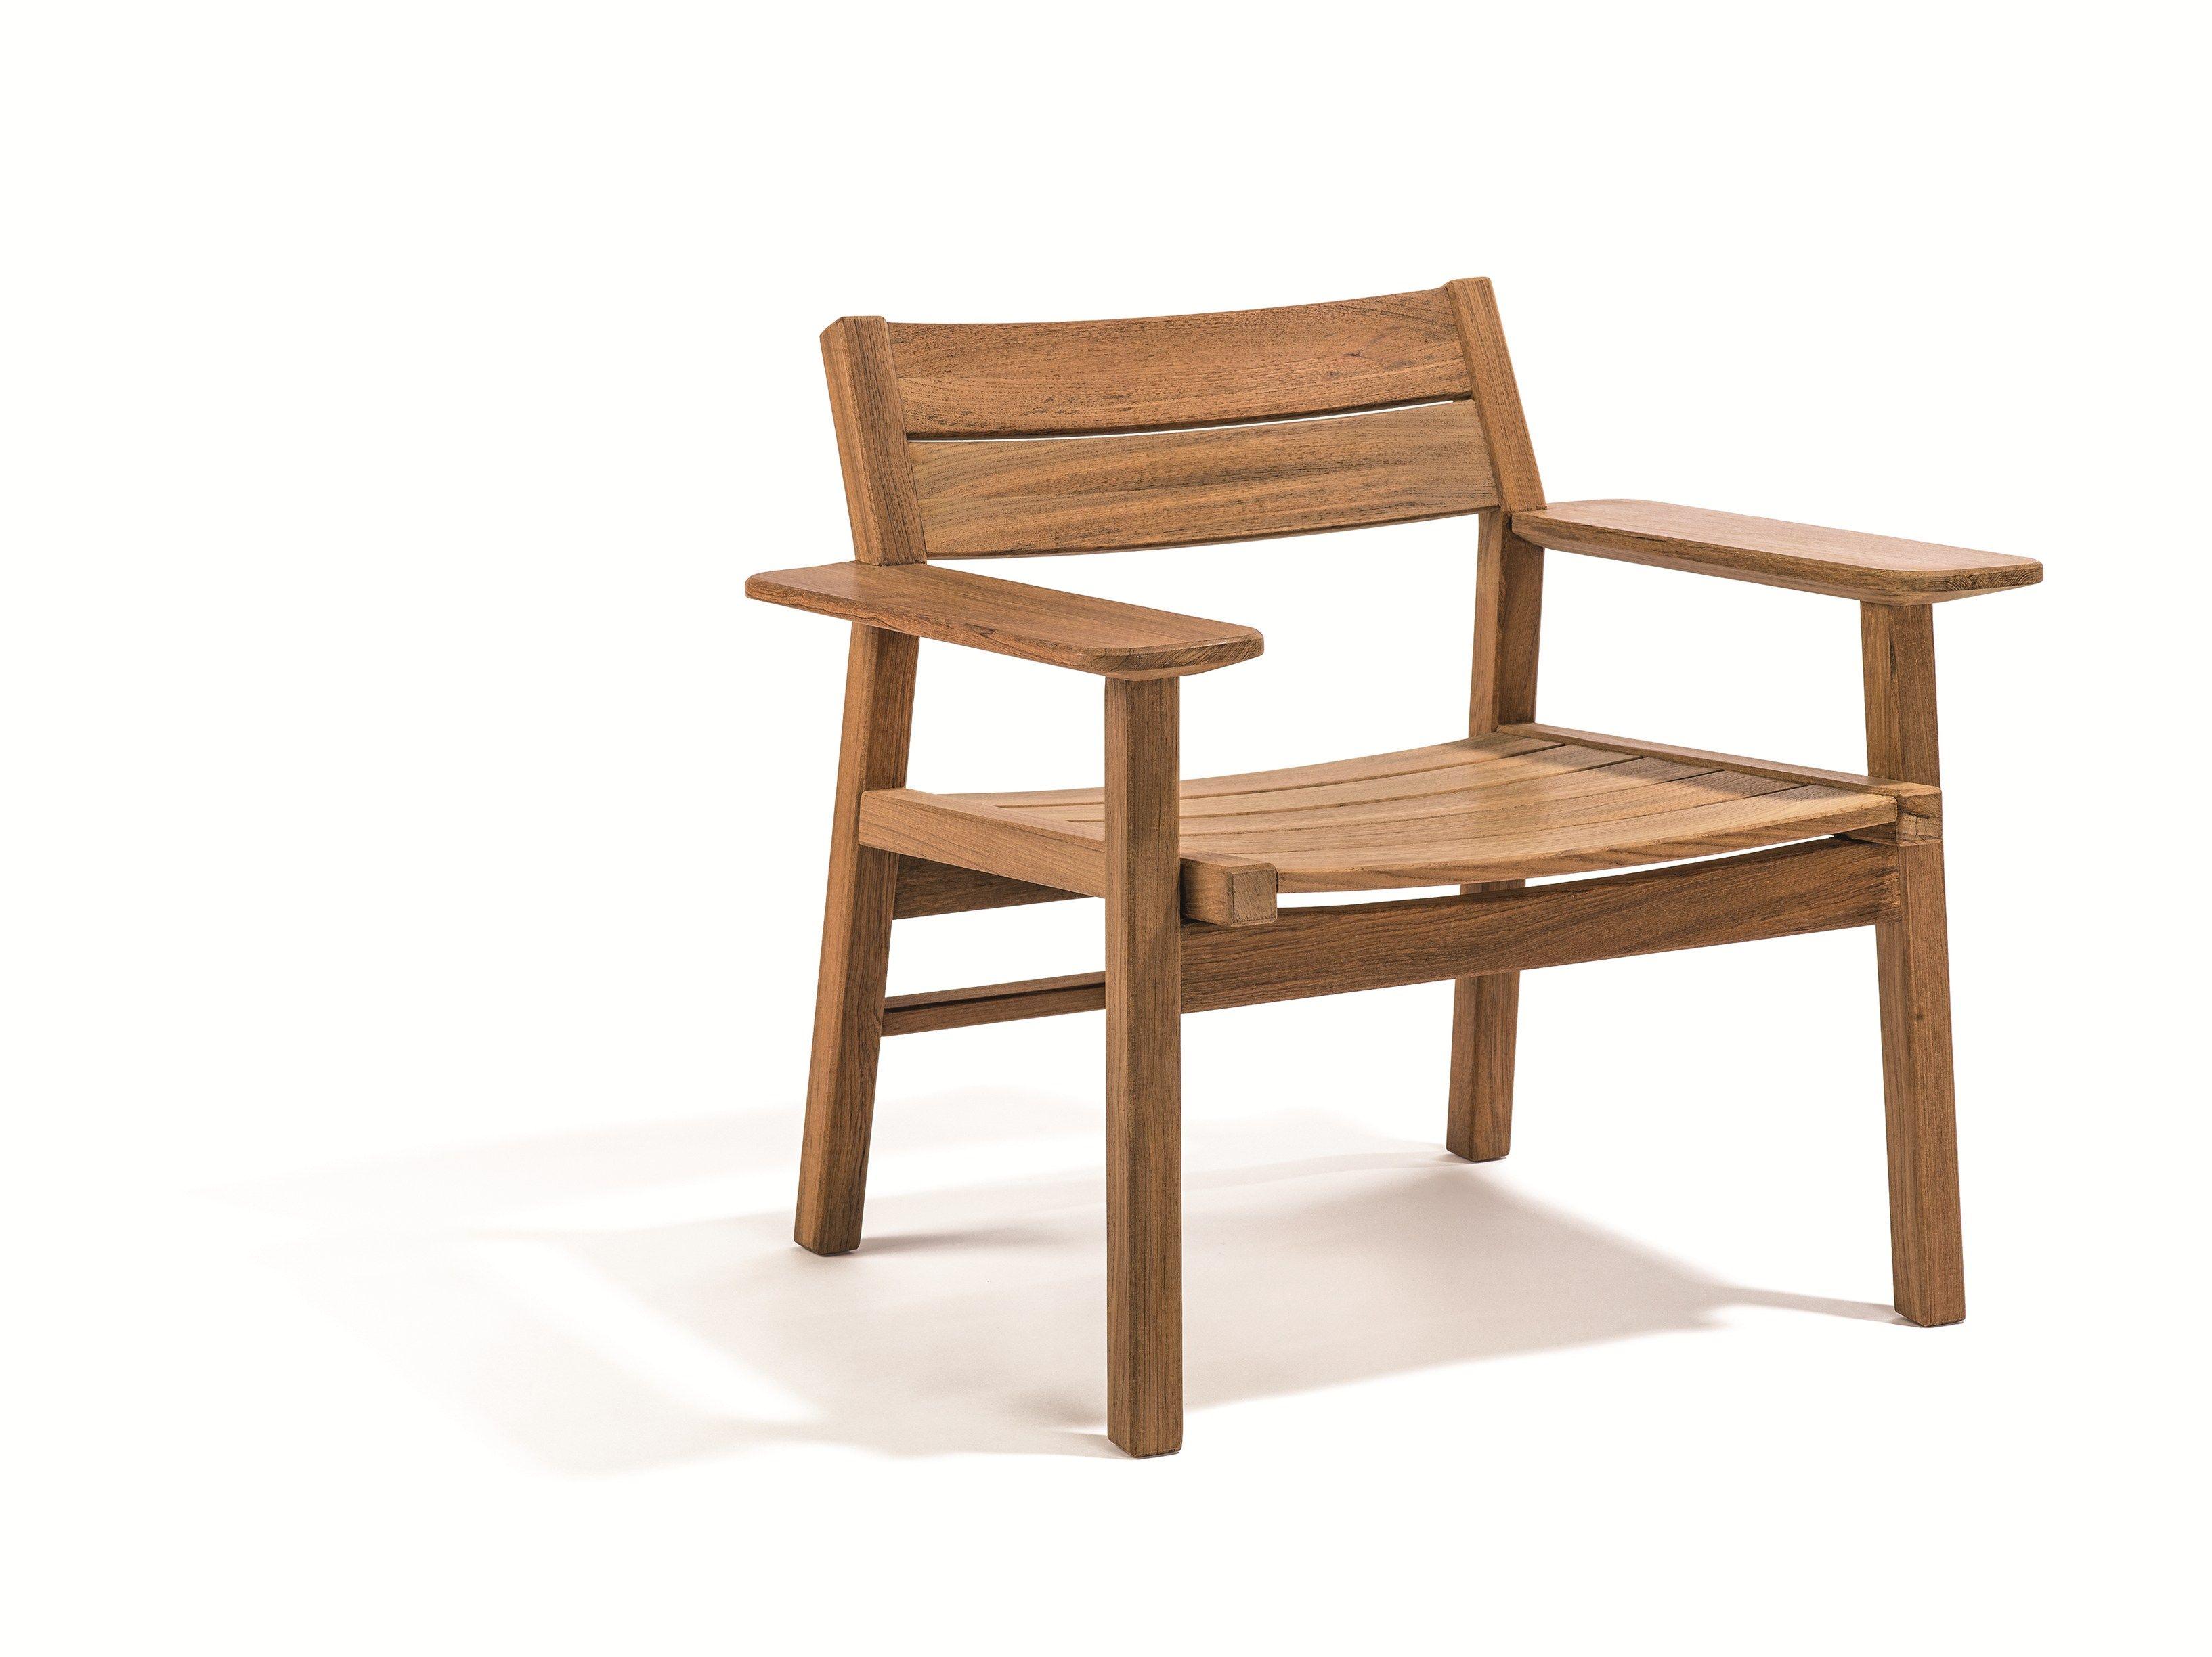 fauteuil jardin. Black Bedroom Furniture Sets. Home Design Ideas